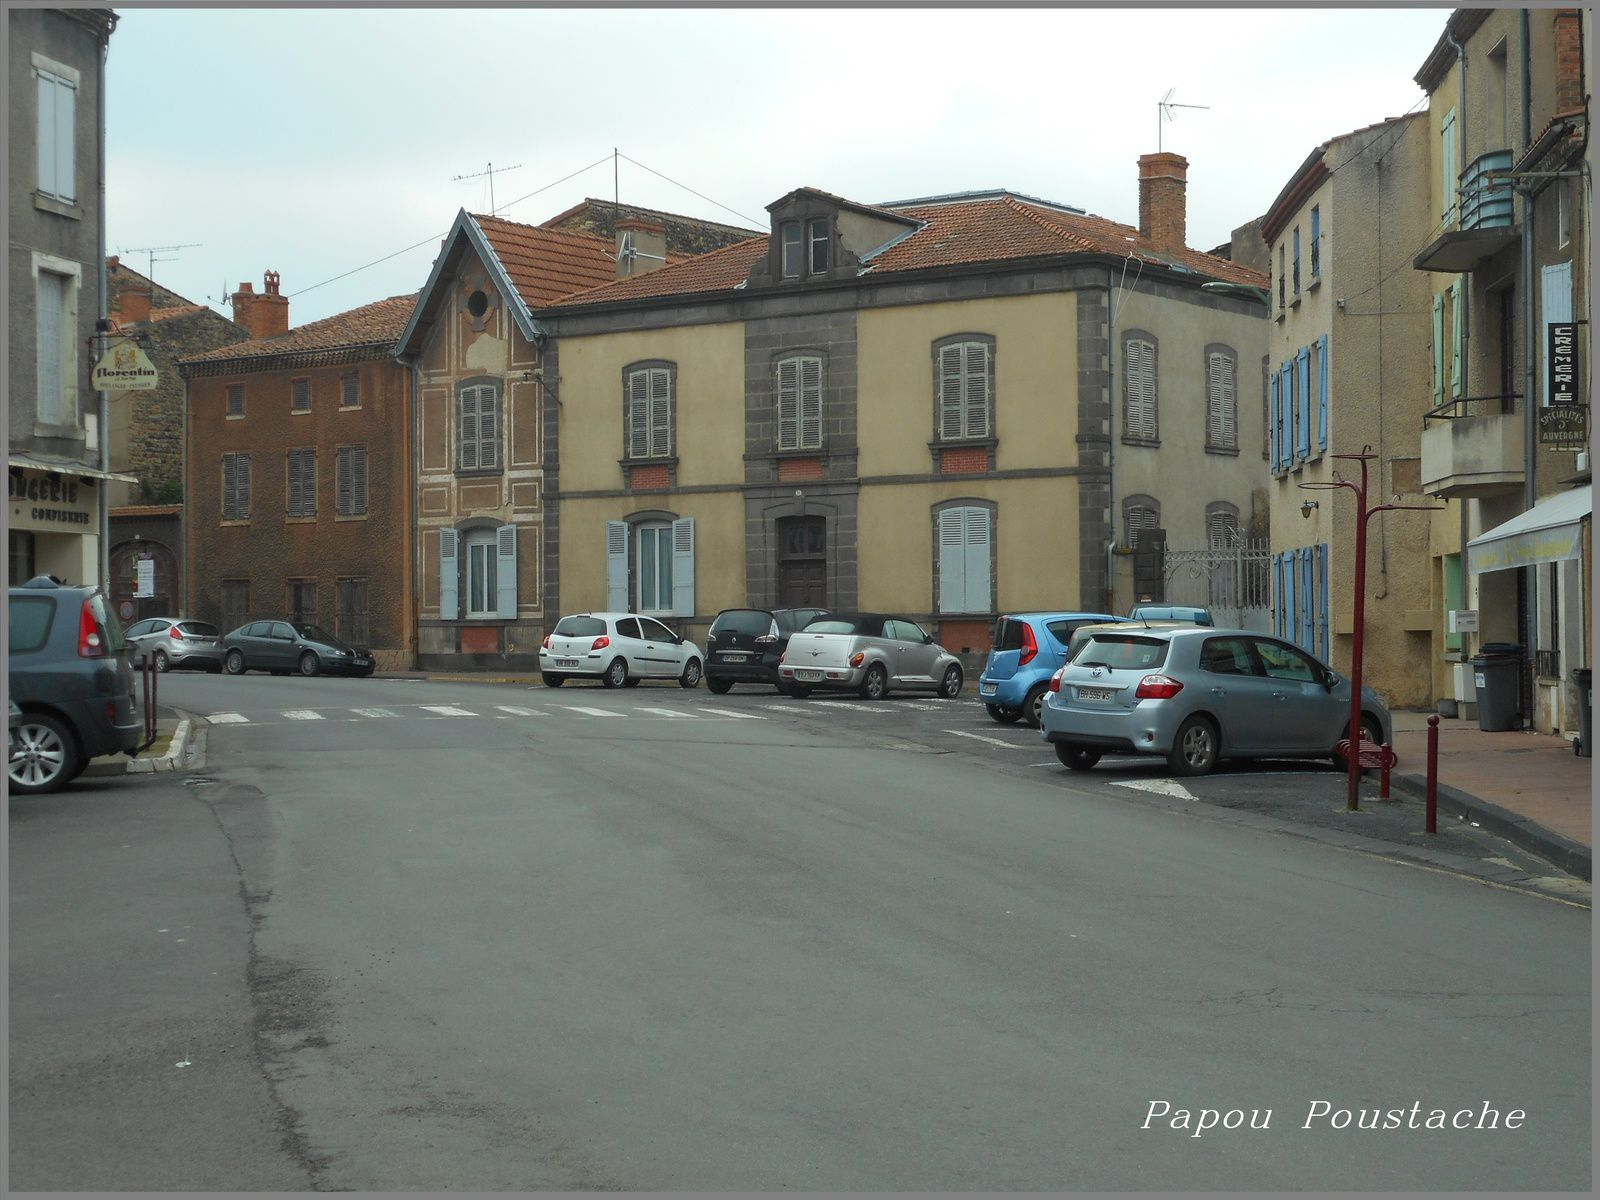 Saint Germain Lembron